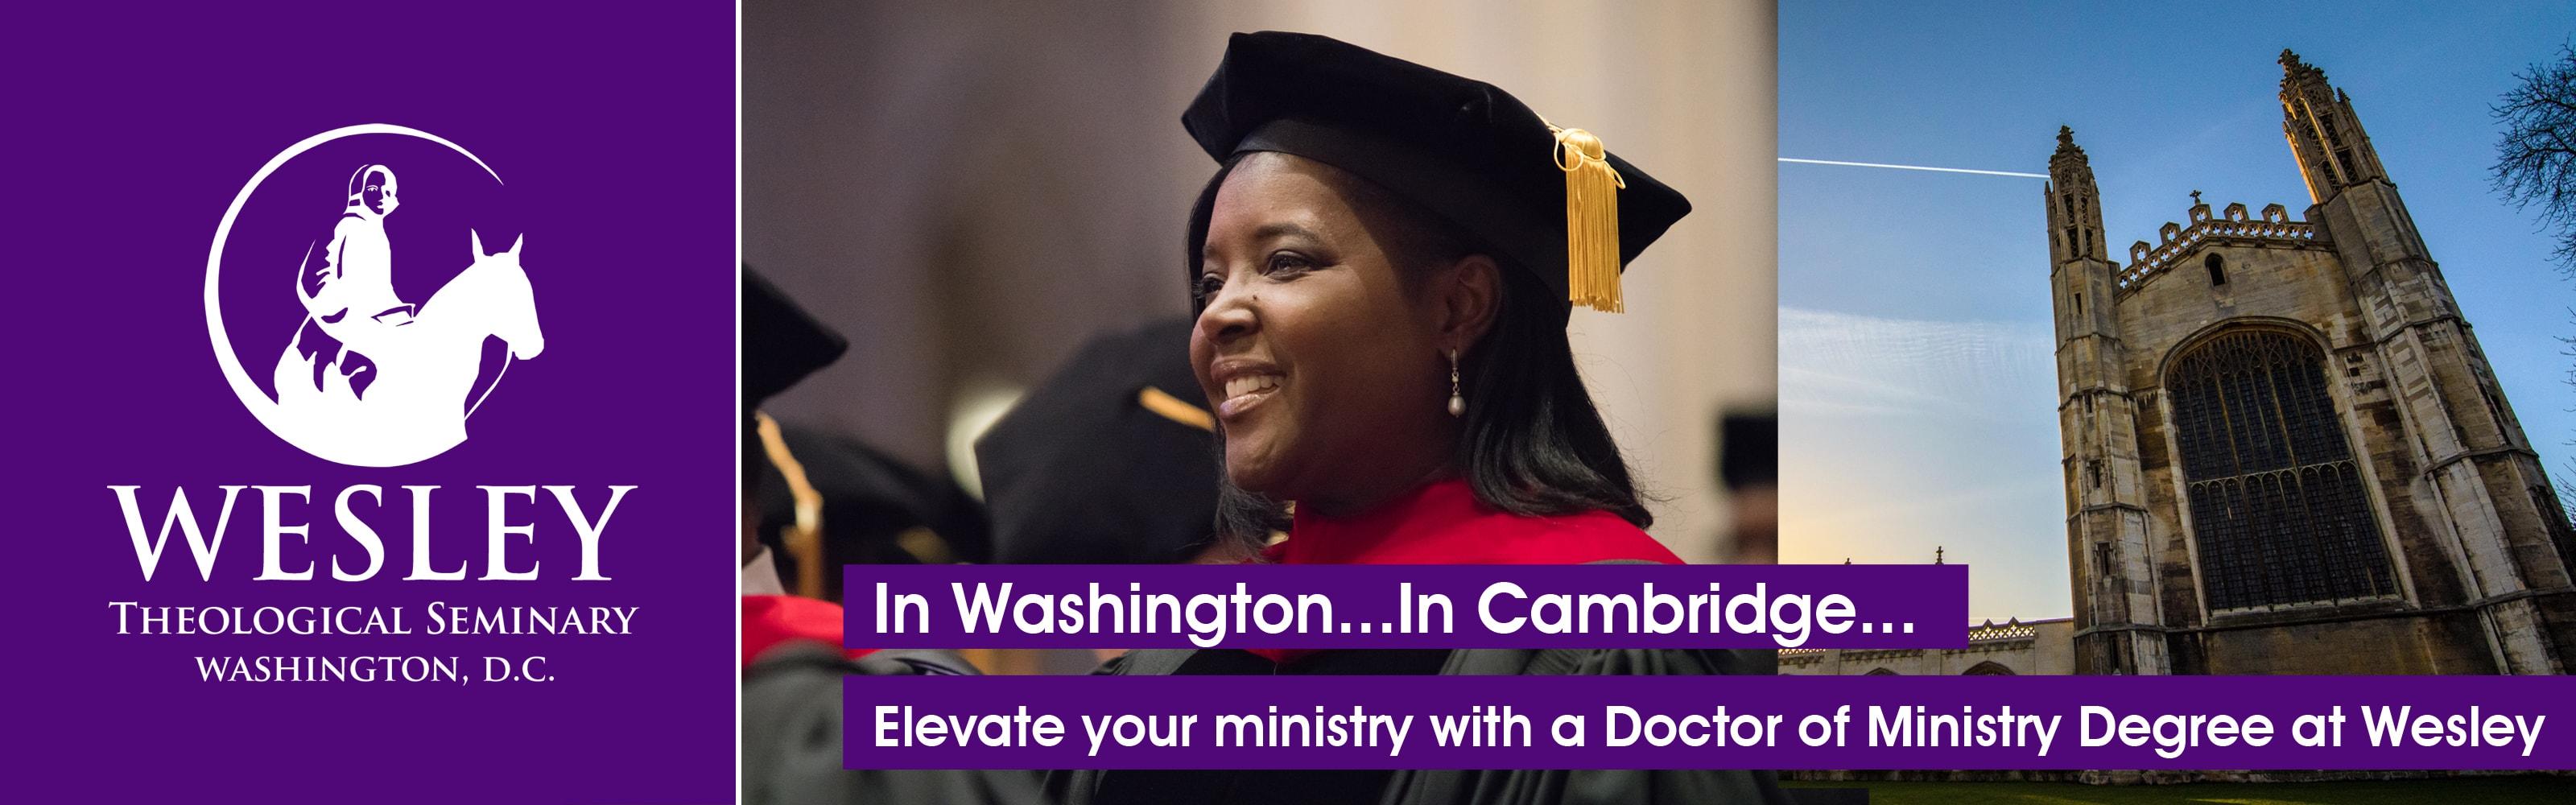 UMC Schools - Wesley Theological Seminary